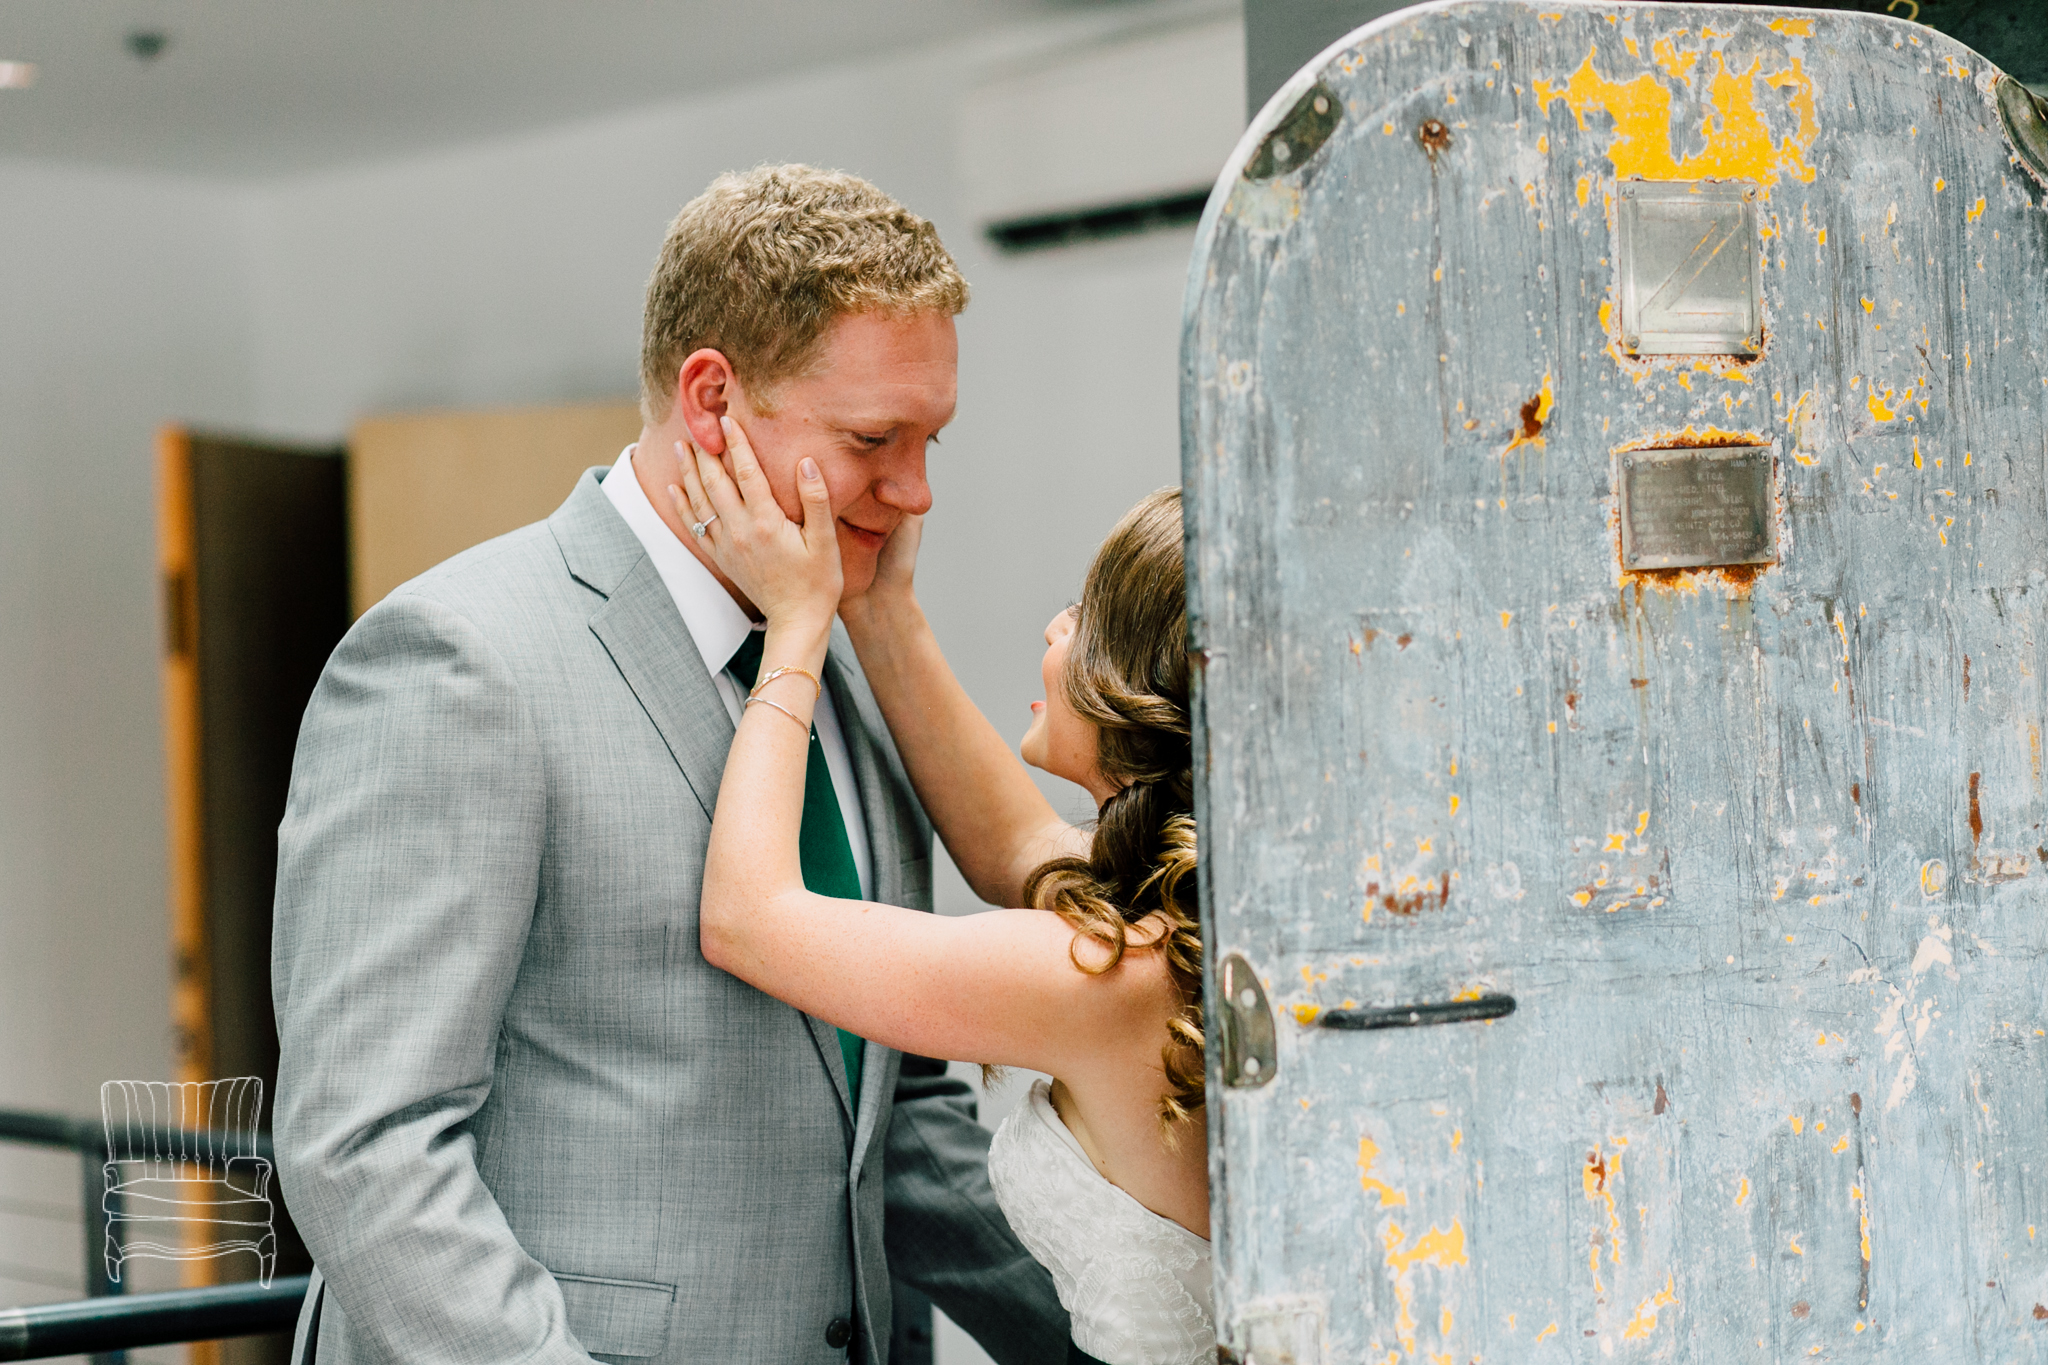 frdmont-foundry-seattle-wedding-katheryn-moran-photography-kait-3.jpg